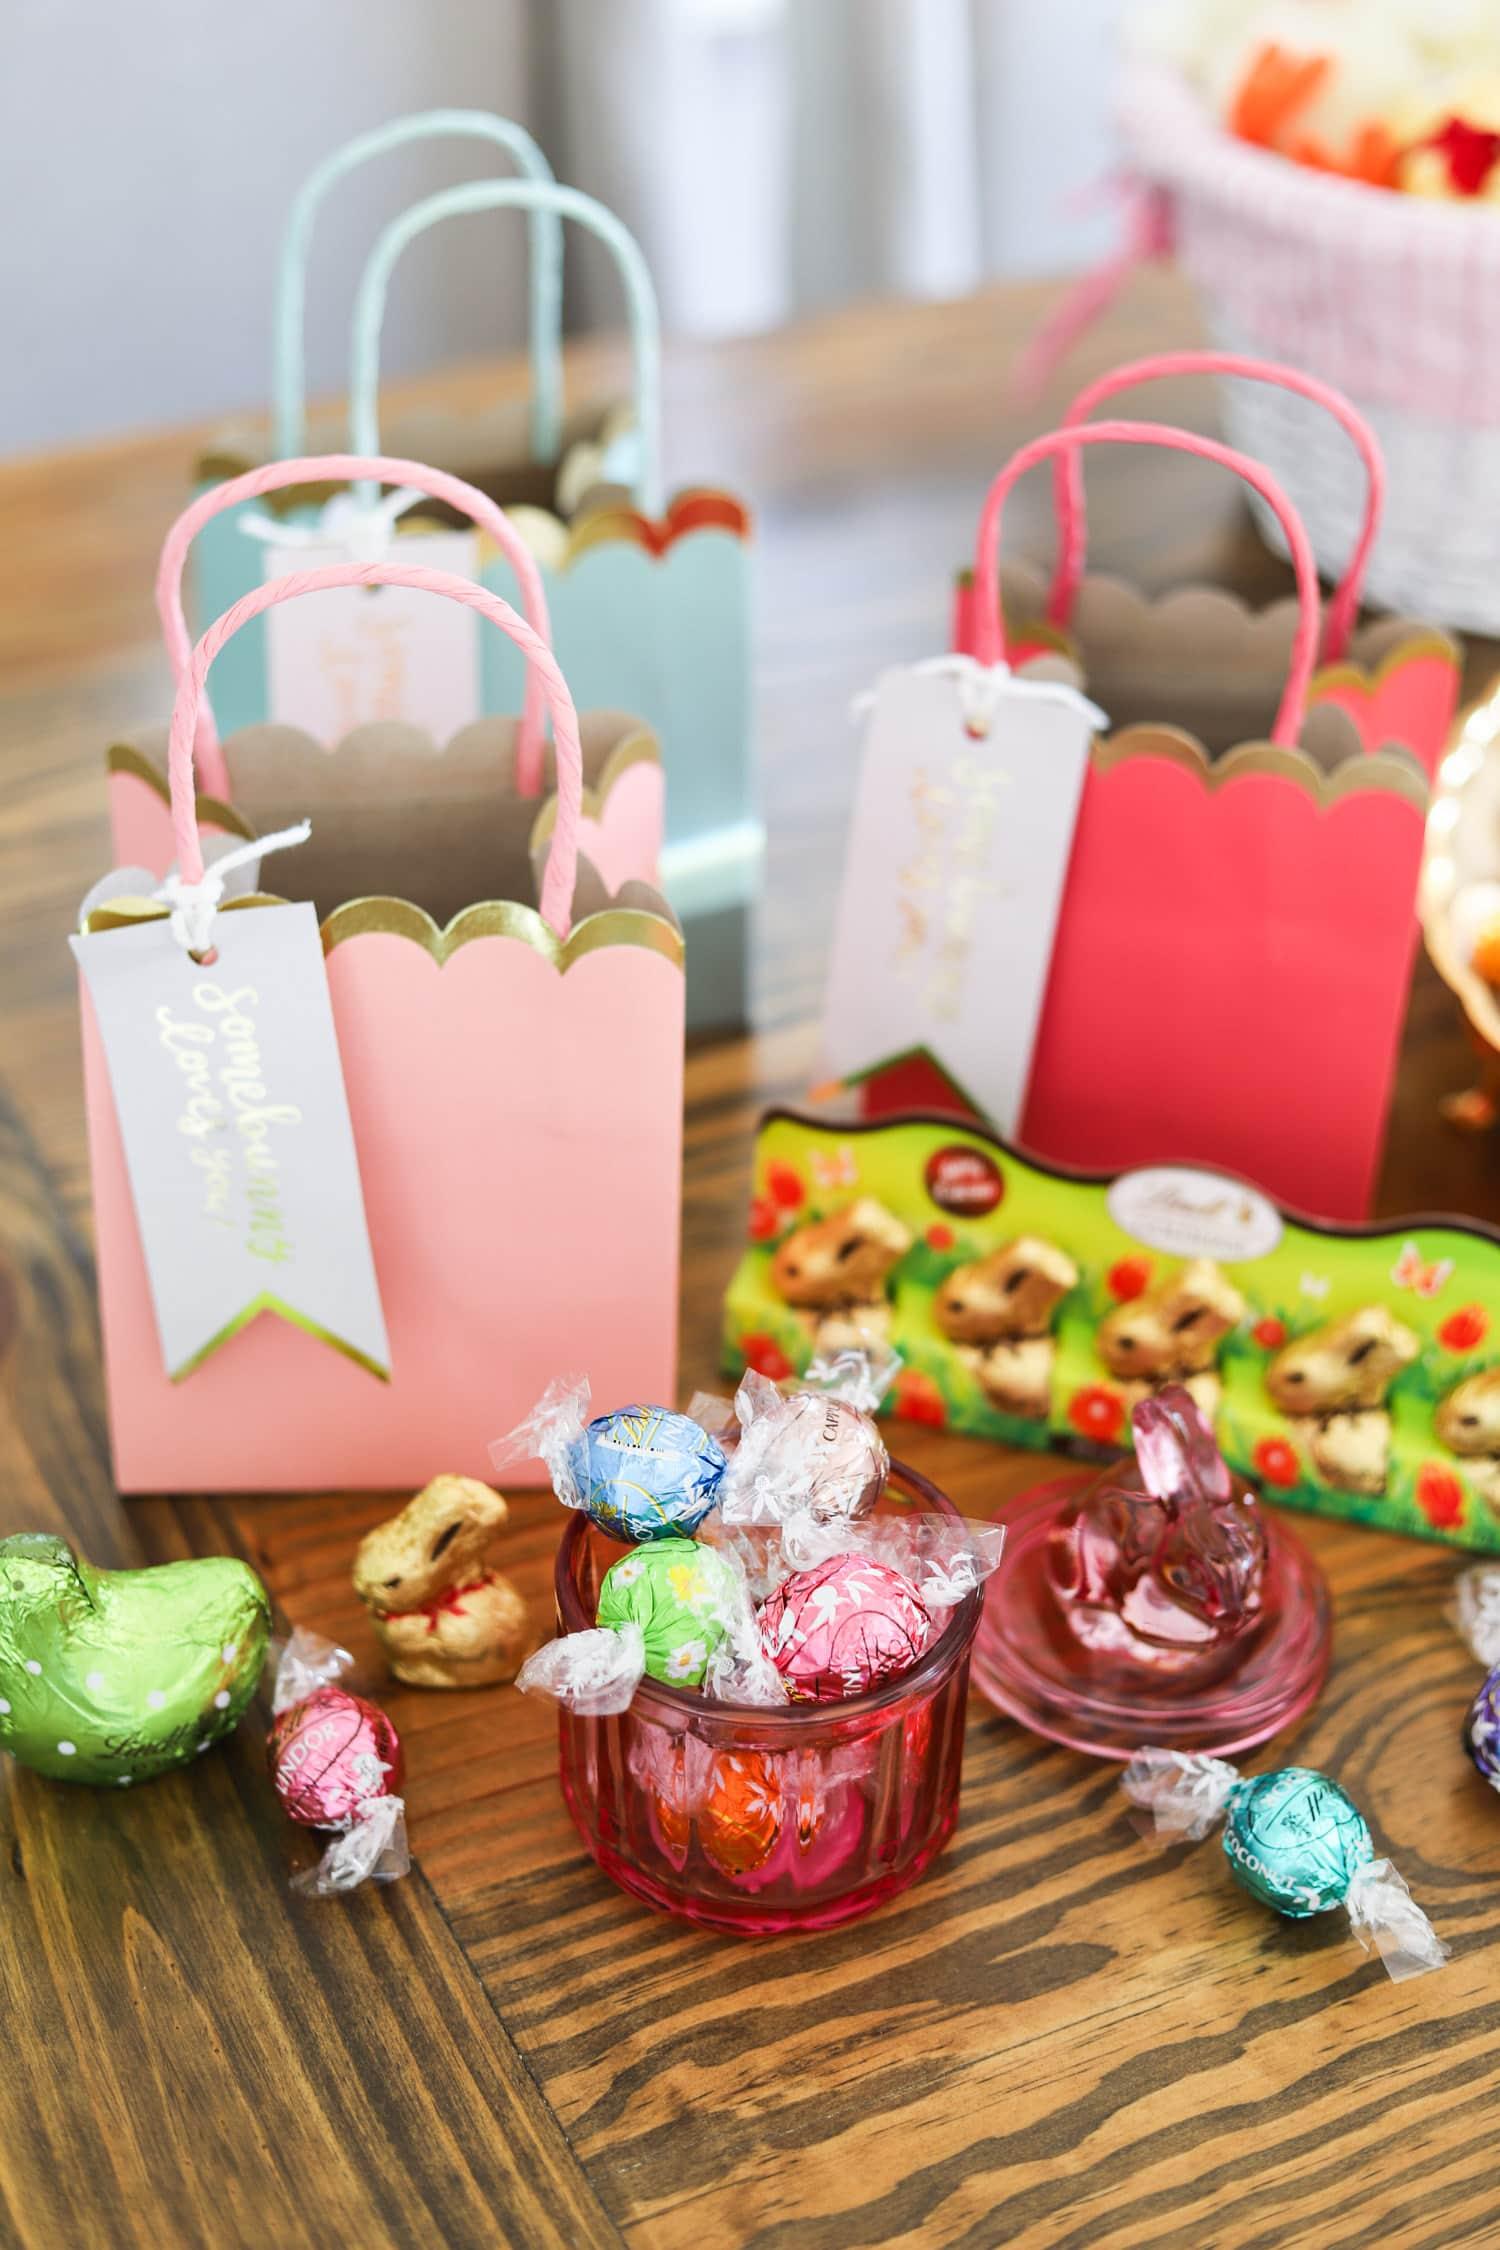 Lindt lindor truffles pink easter bag gold easter bunny lindt party favors for Easter Sunday Easter party